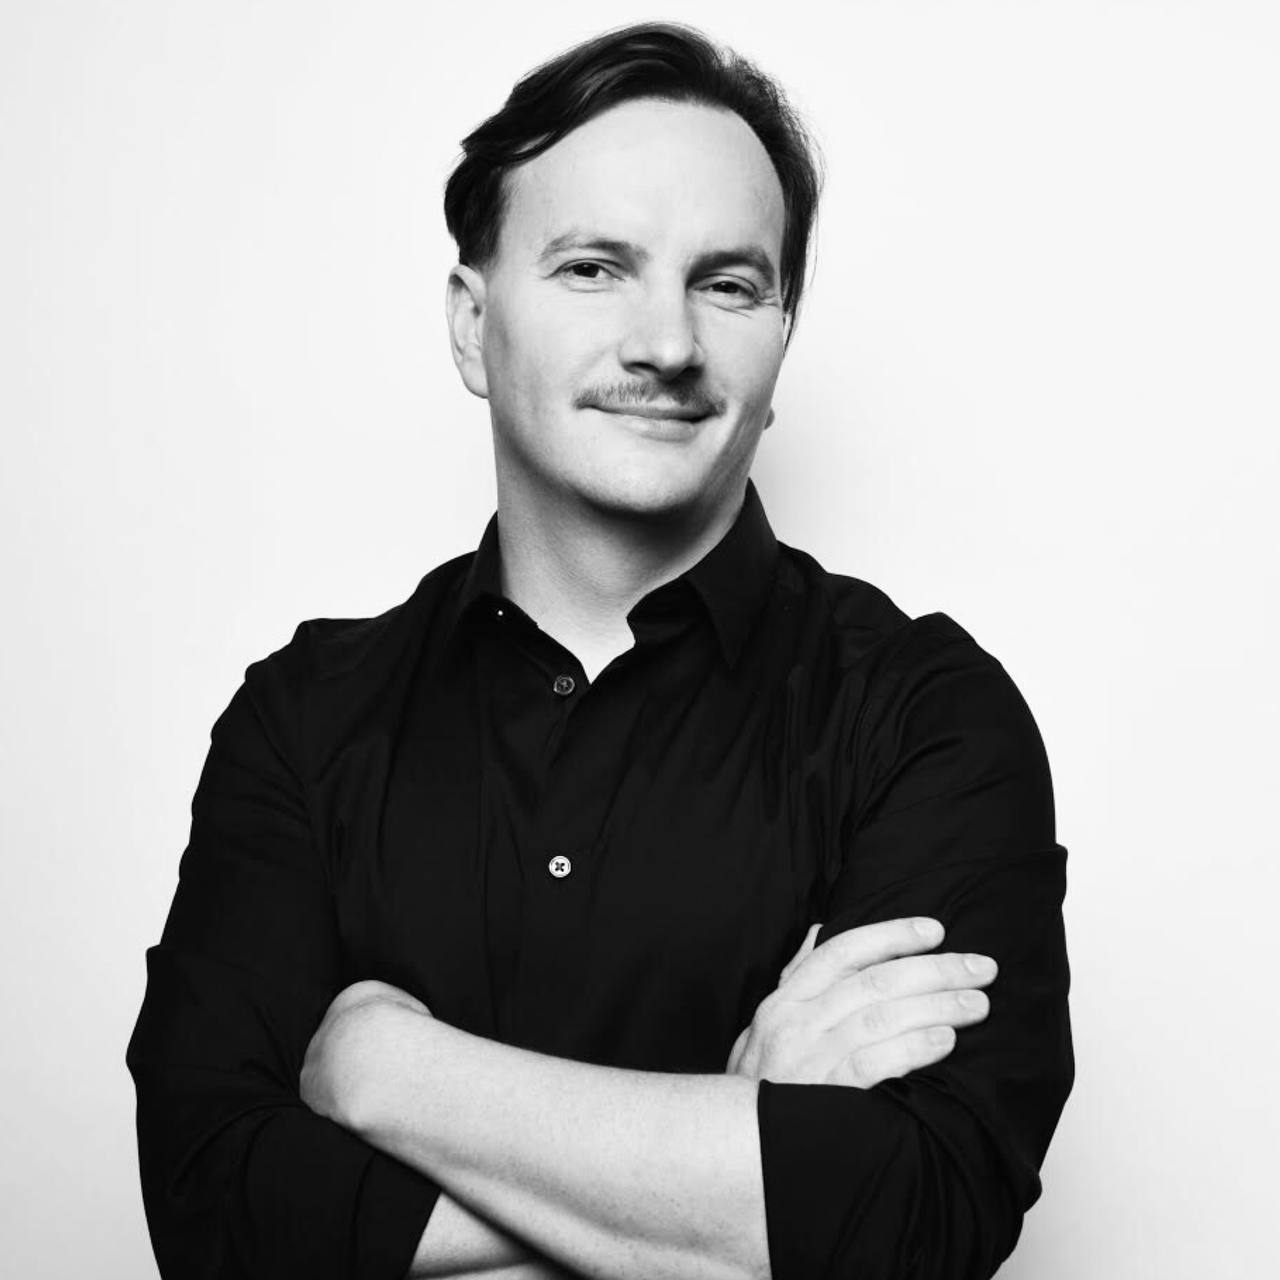 Alex Blagirev